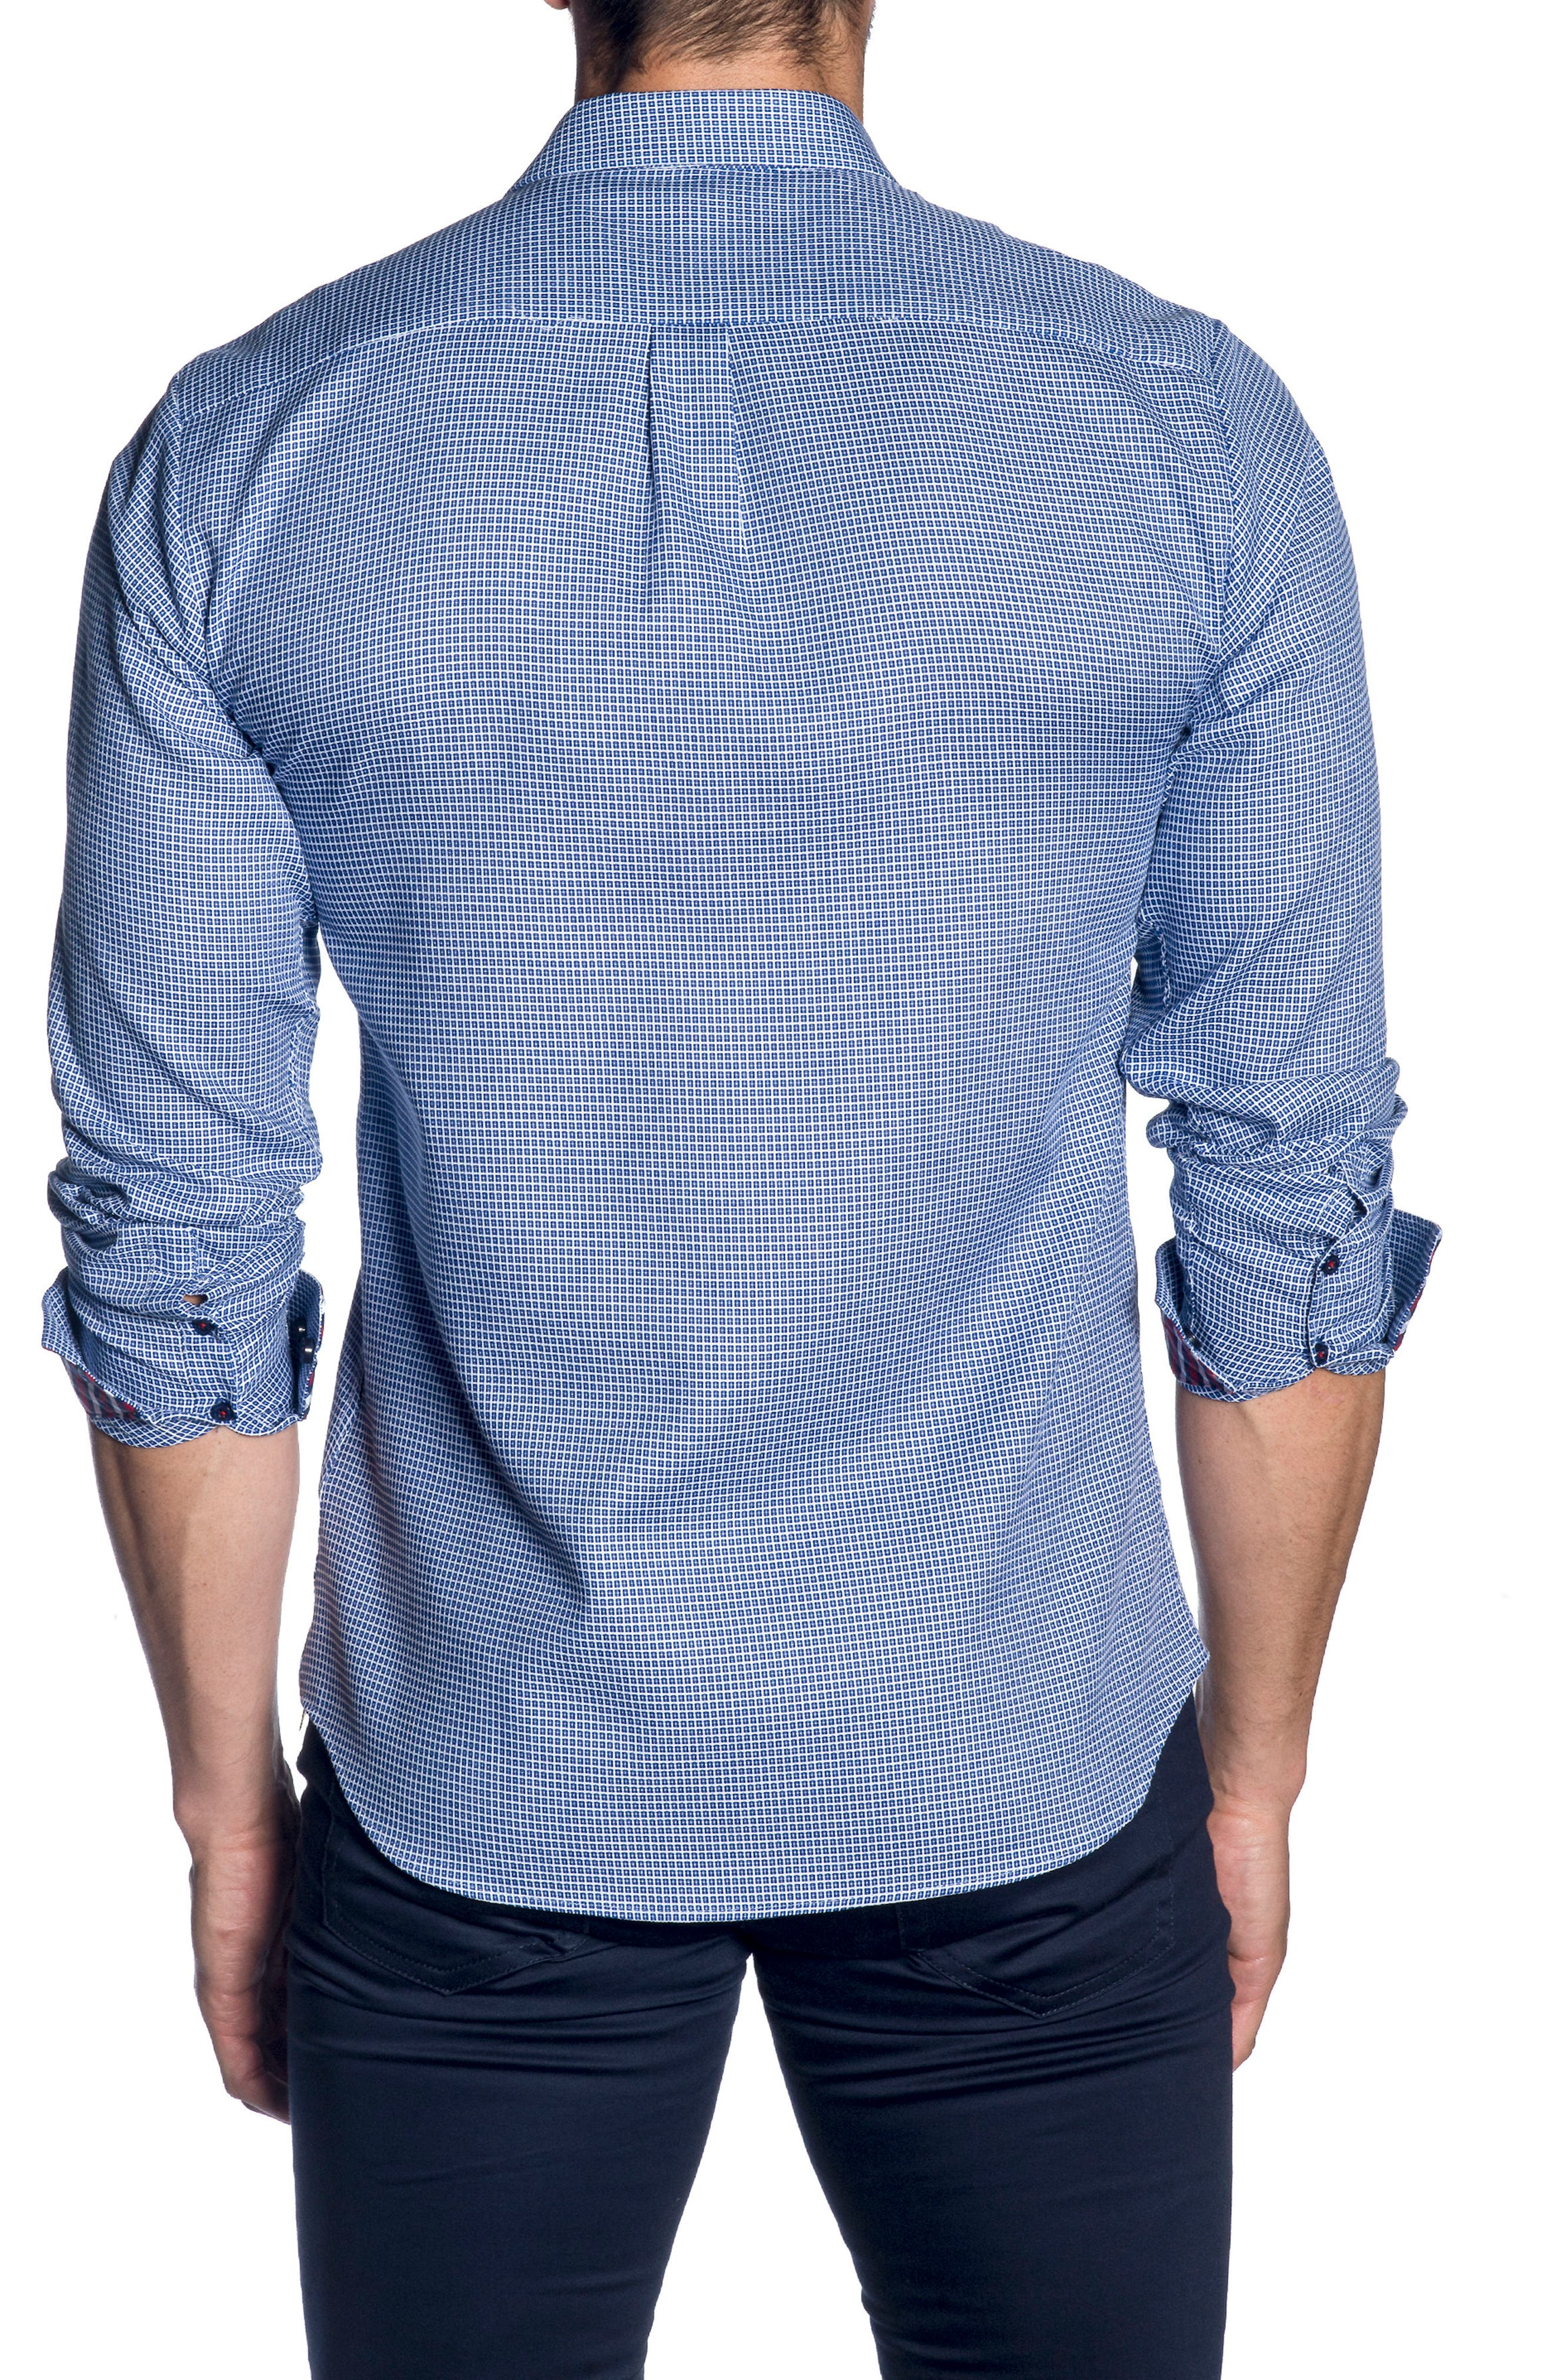 Trim Fit Sport Shirt,                             Alternate thumbnail 2, color,                             French Blue  White